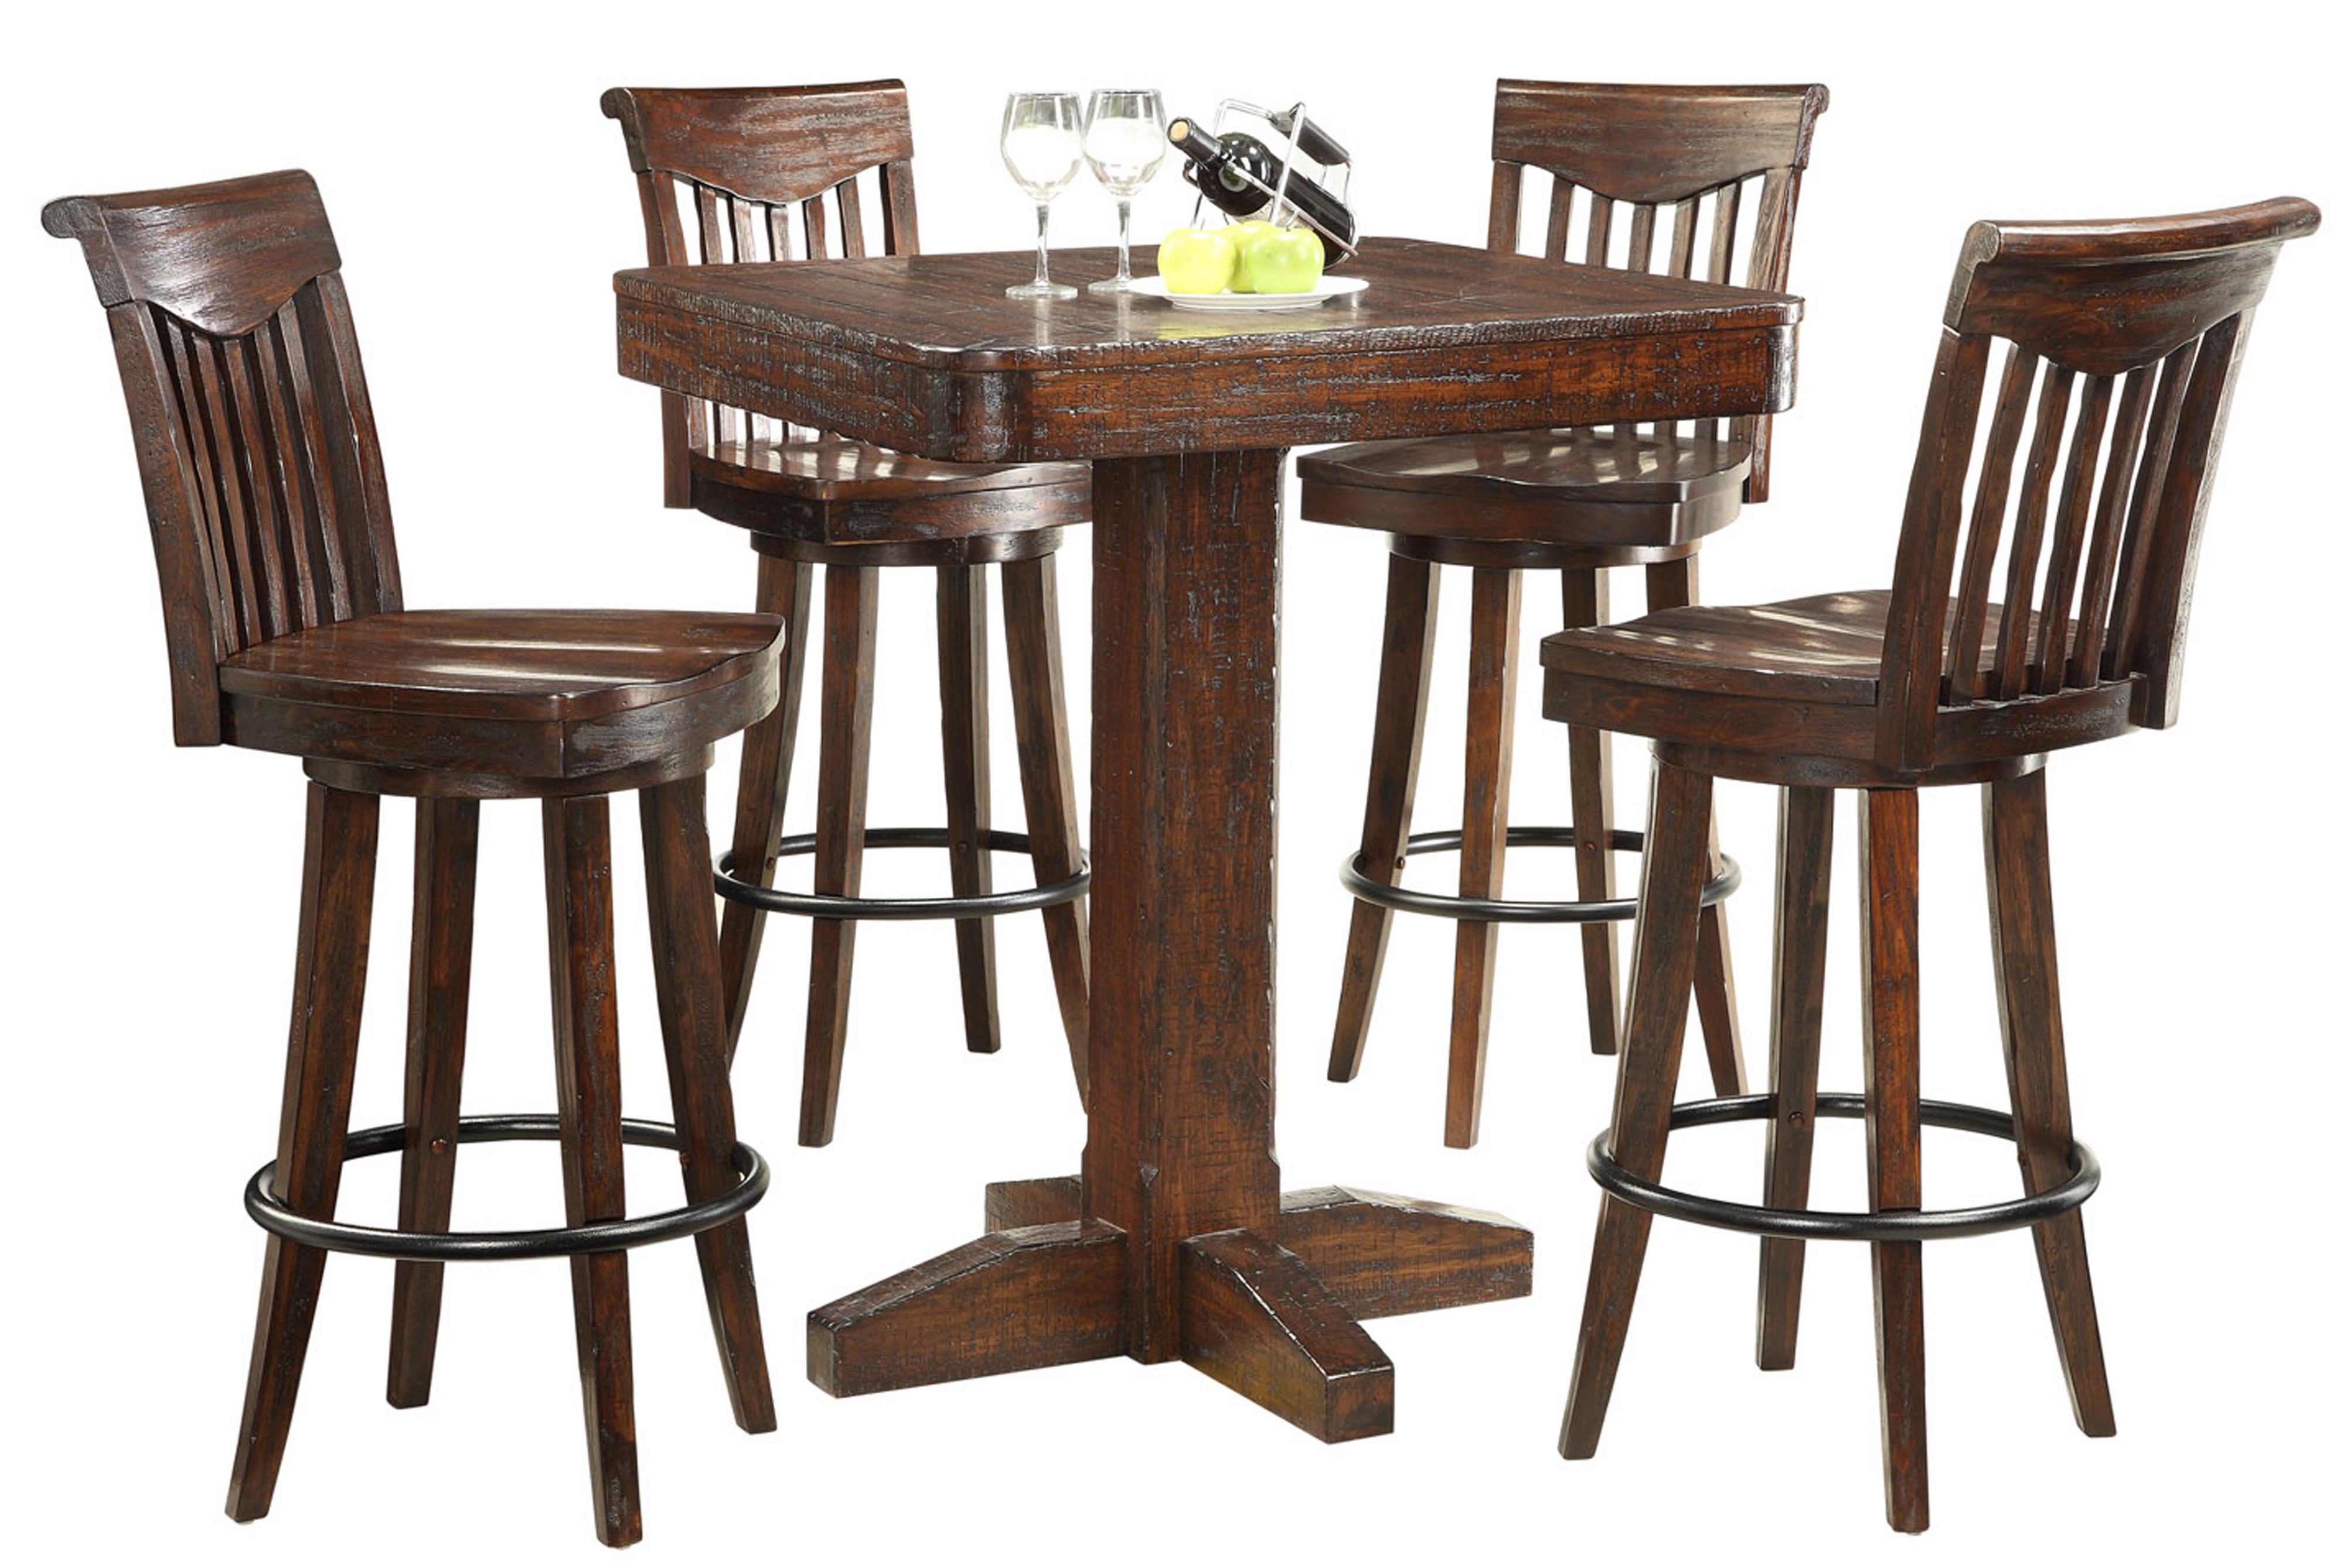 E.C.I. Furniture Gettysburg 5 Piece Pub Table and Stools - Item Number: 1475-05-PT36+4xBS30